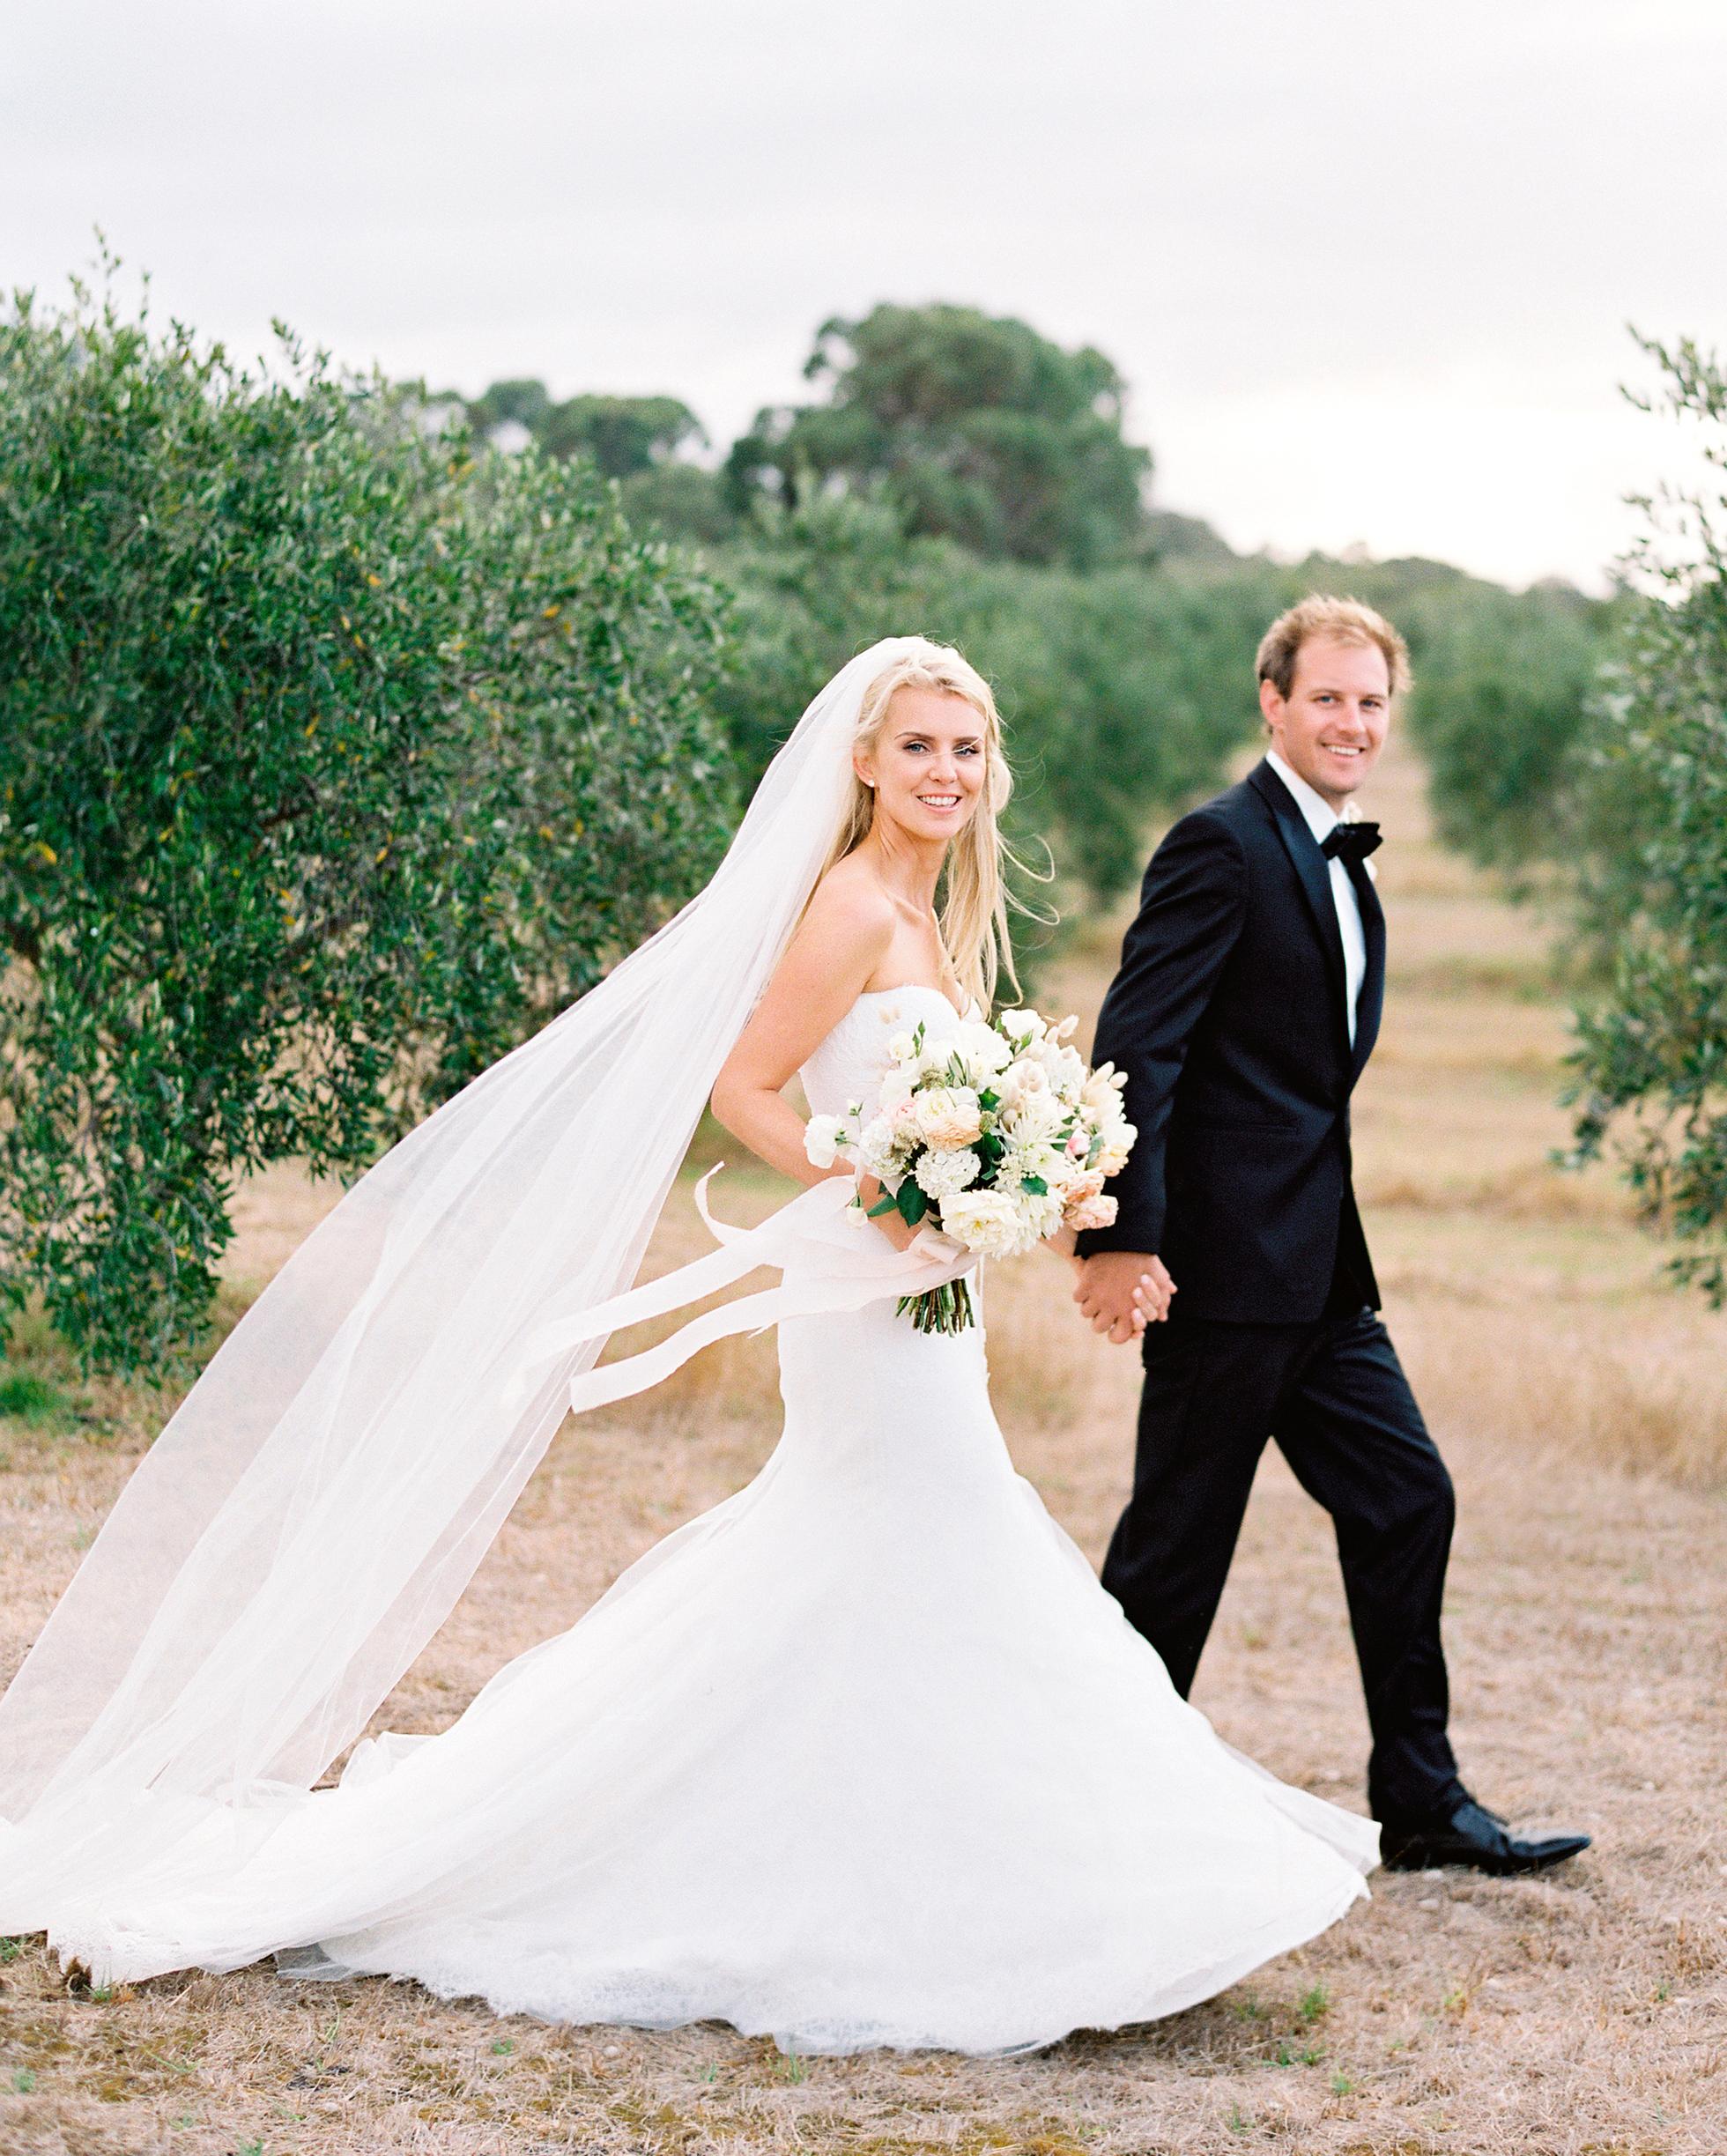 jemma-michael-wedding-couple-002577014-s112110-0815.jpg